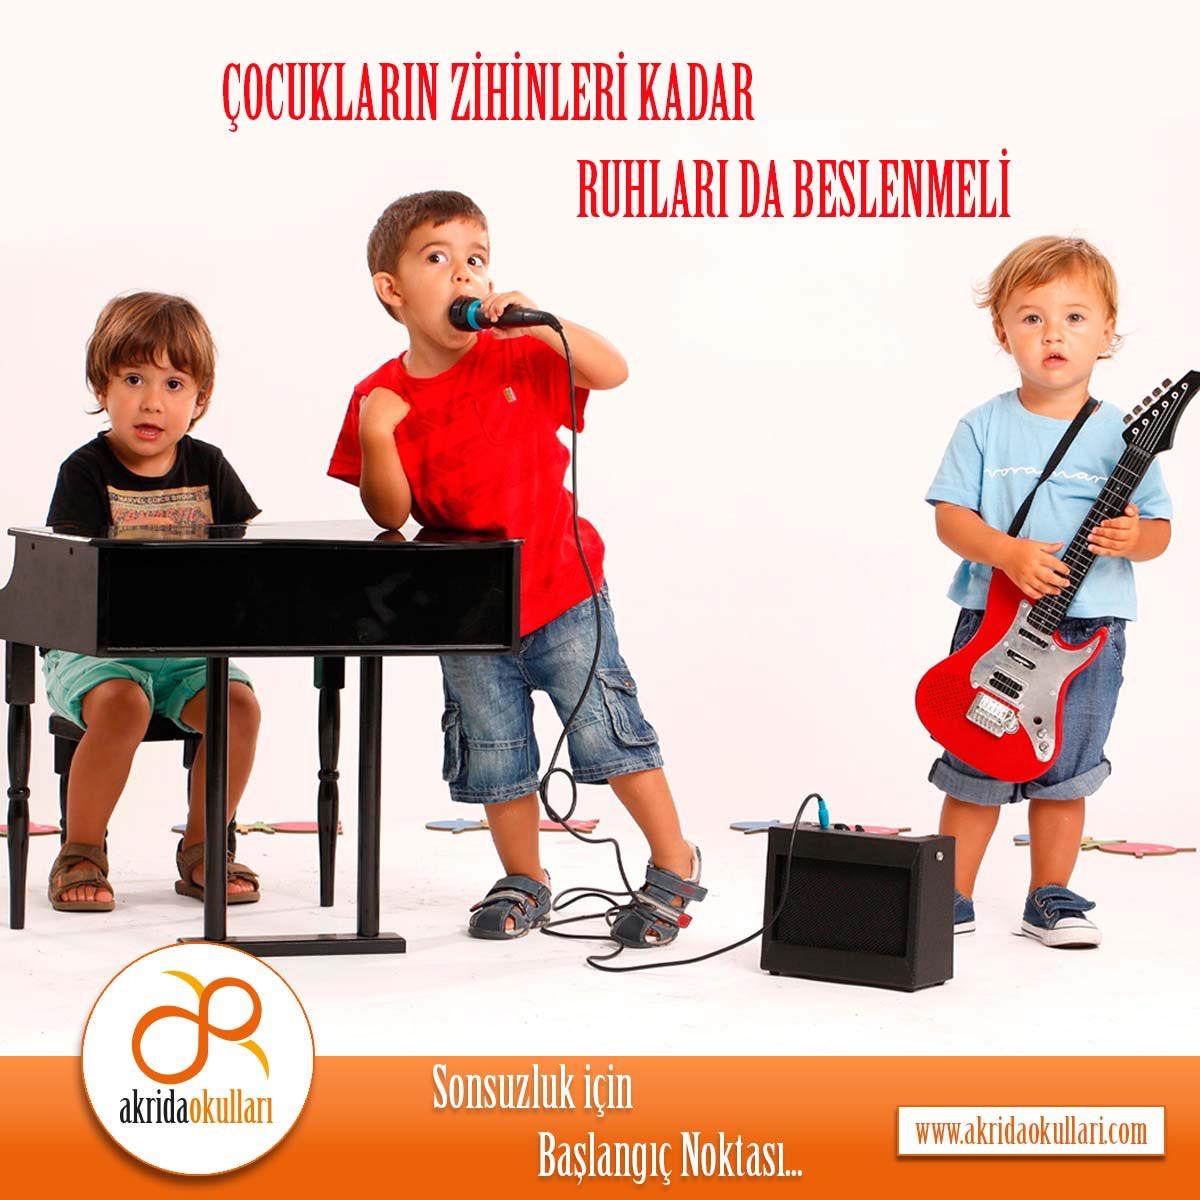 child childrens music school - HD1231×773